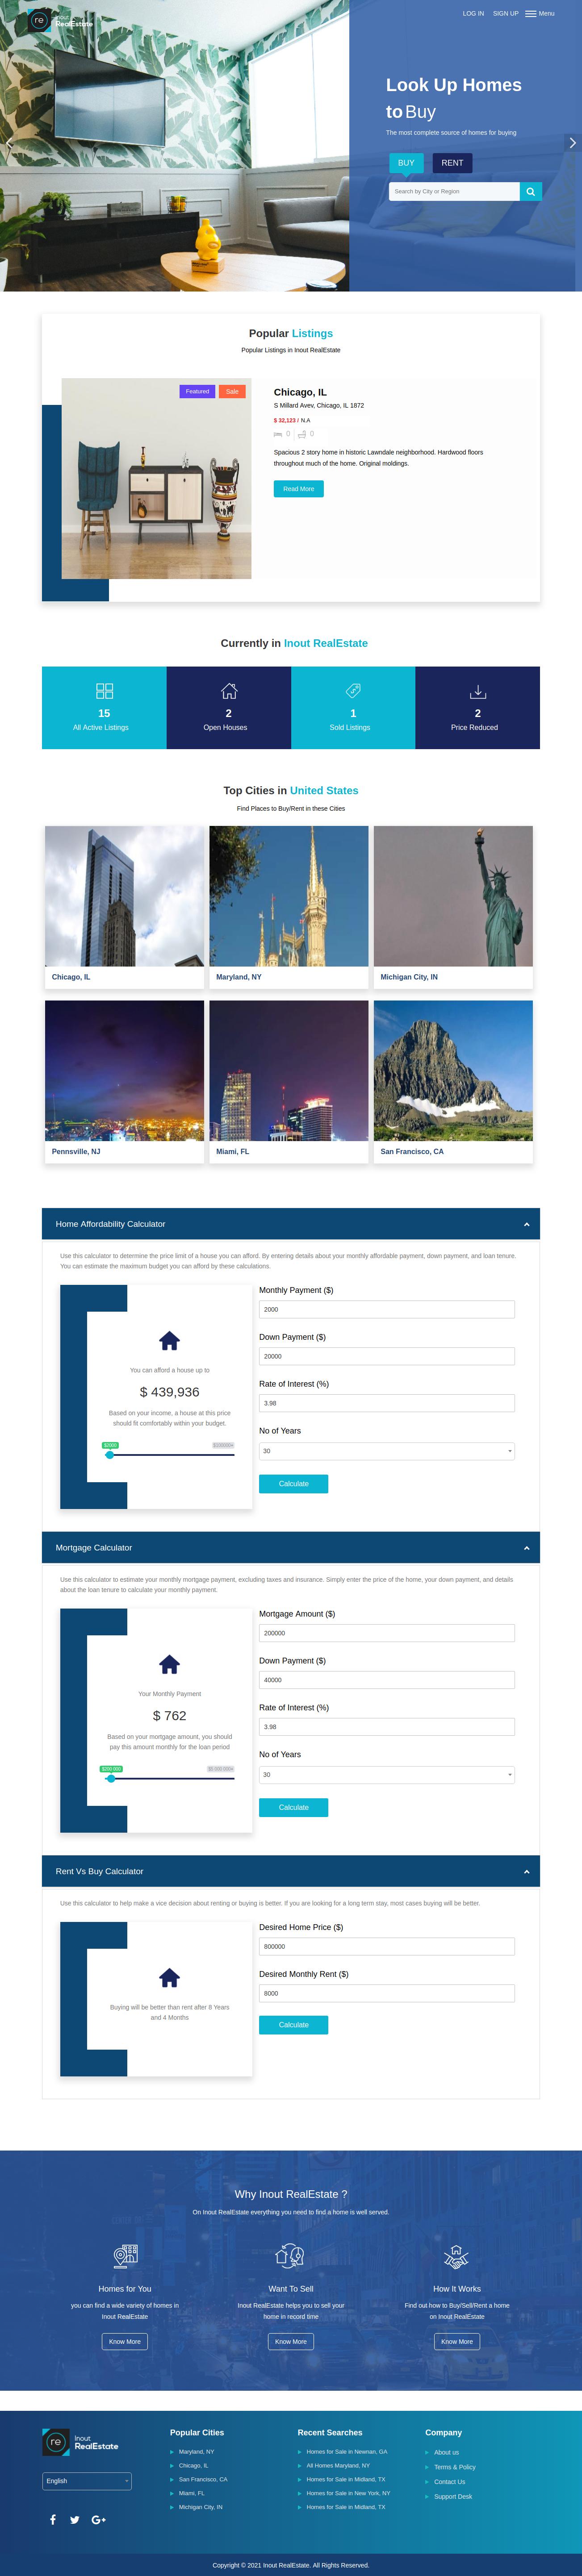 Inout RealEstate - Map Based Advanced Real Estate Portal - Screenshot 1